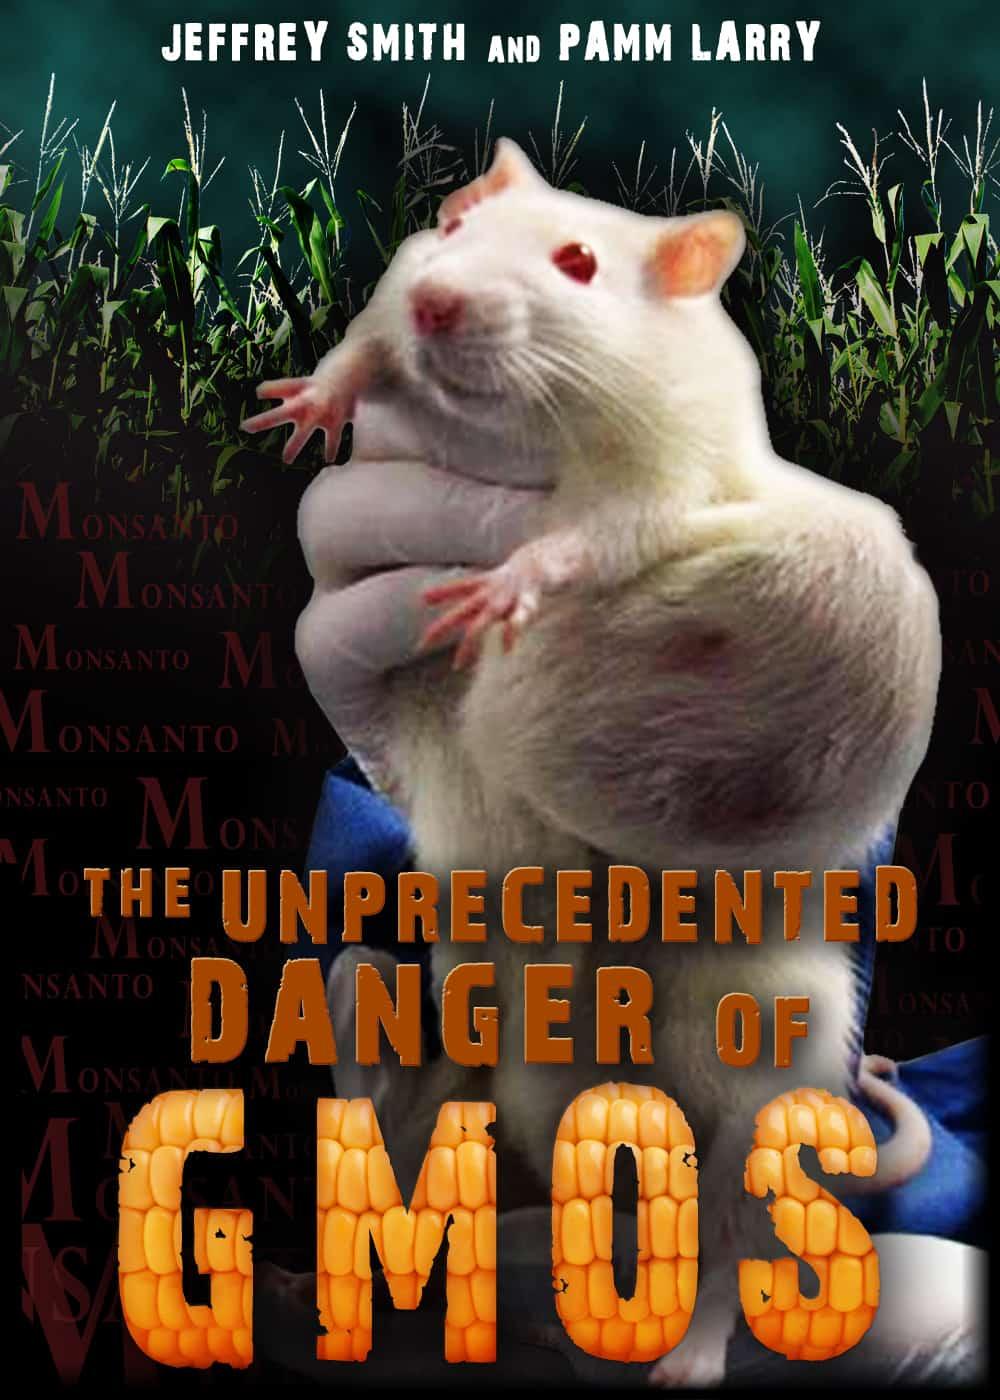 The Unprecedented Danger of GMOs